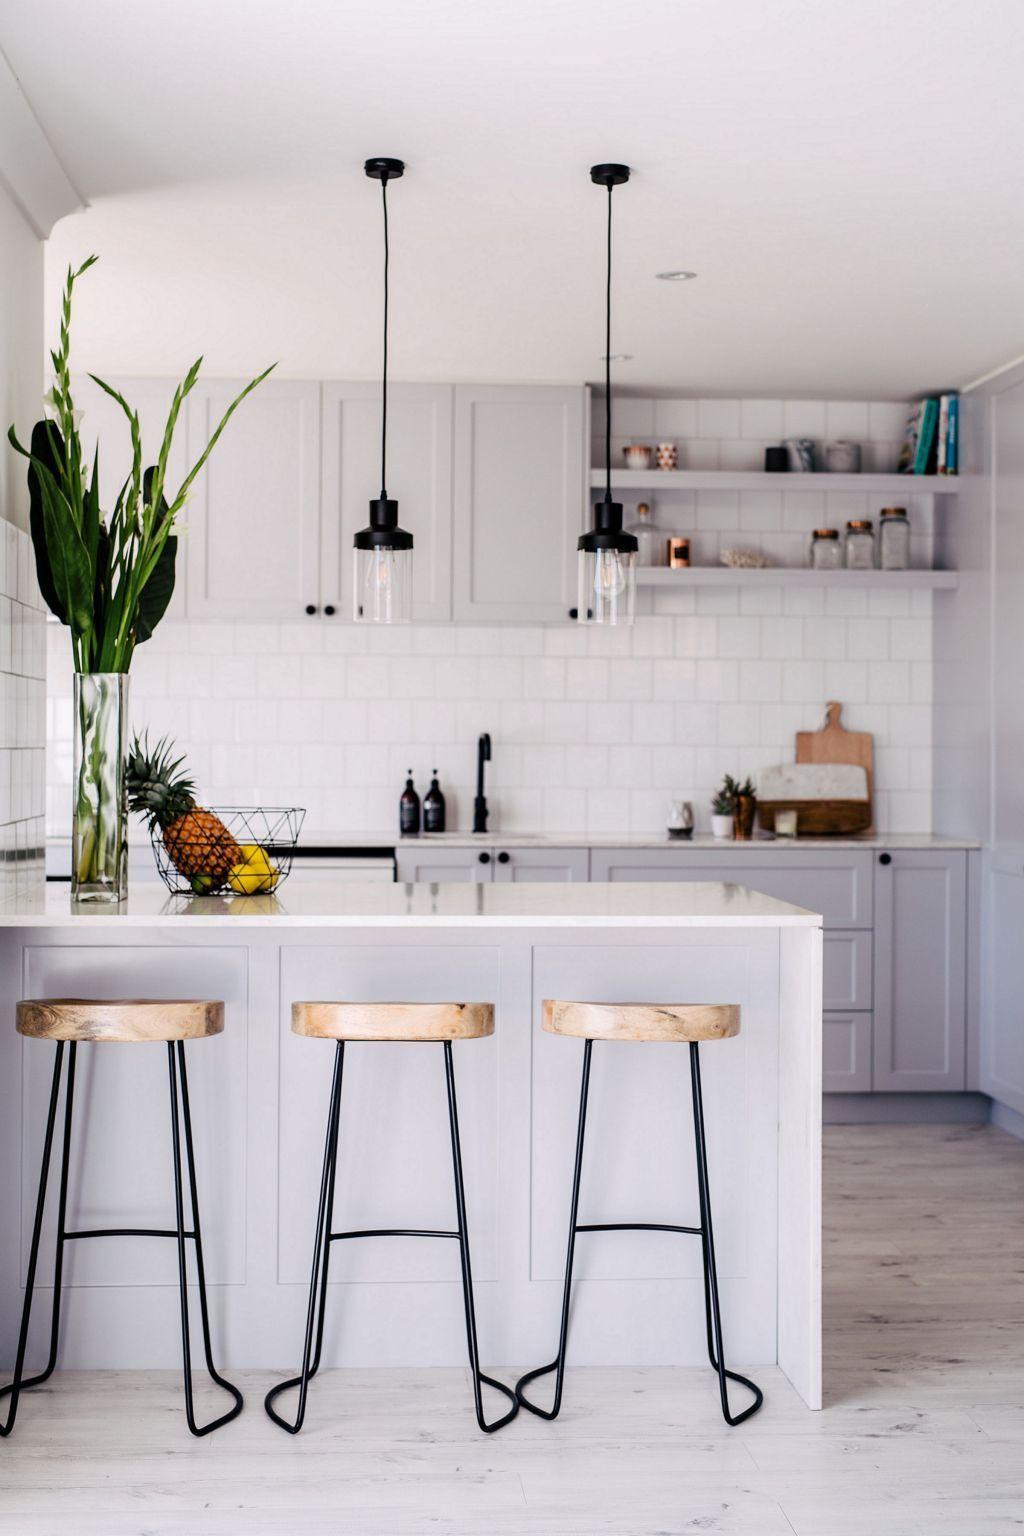 Photo Gallery Minimalist Kitchen Design Spark Love In 2020 Small Modern Kitchens Small White Kitchens White Kitchen Design